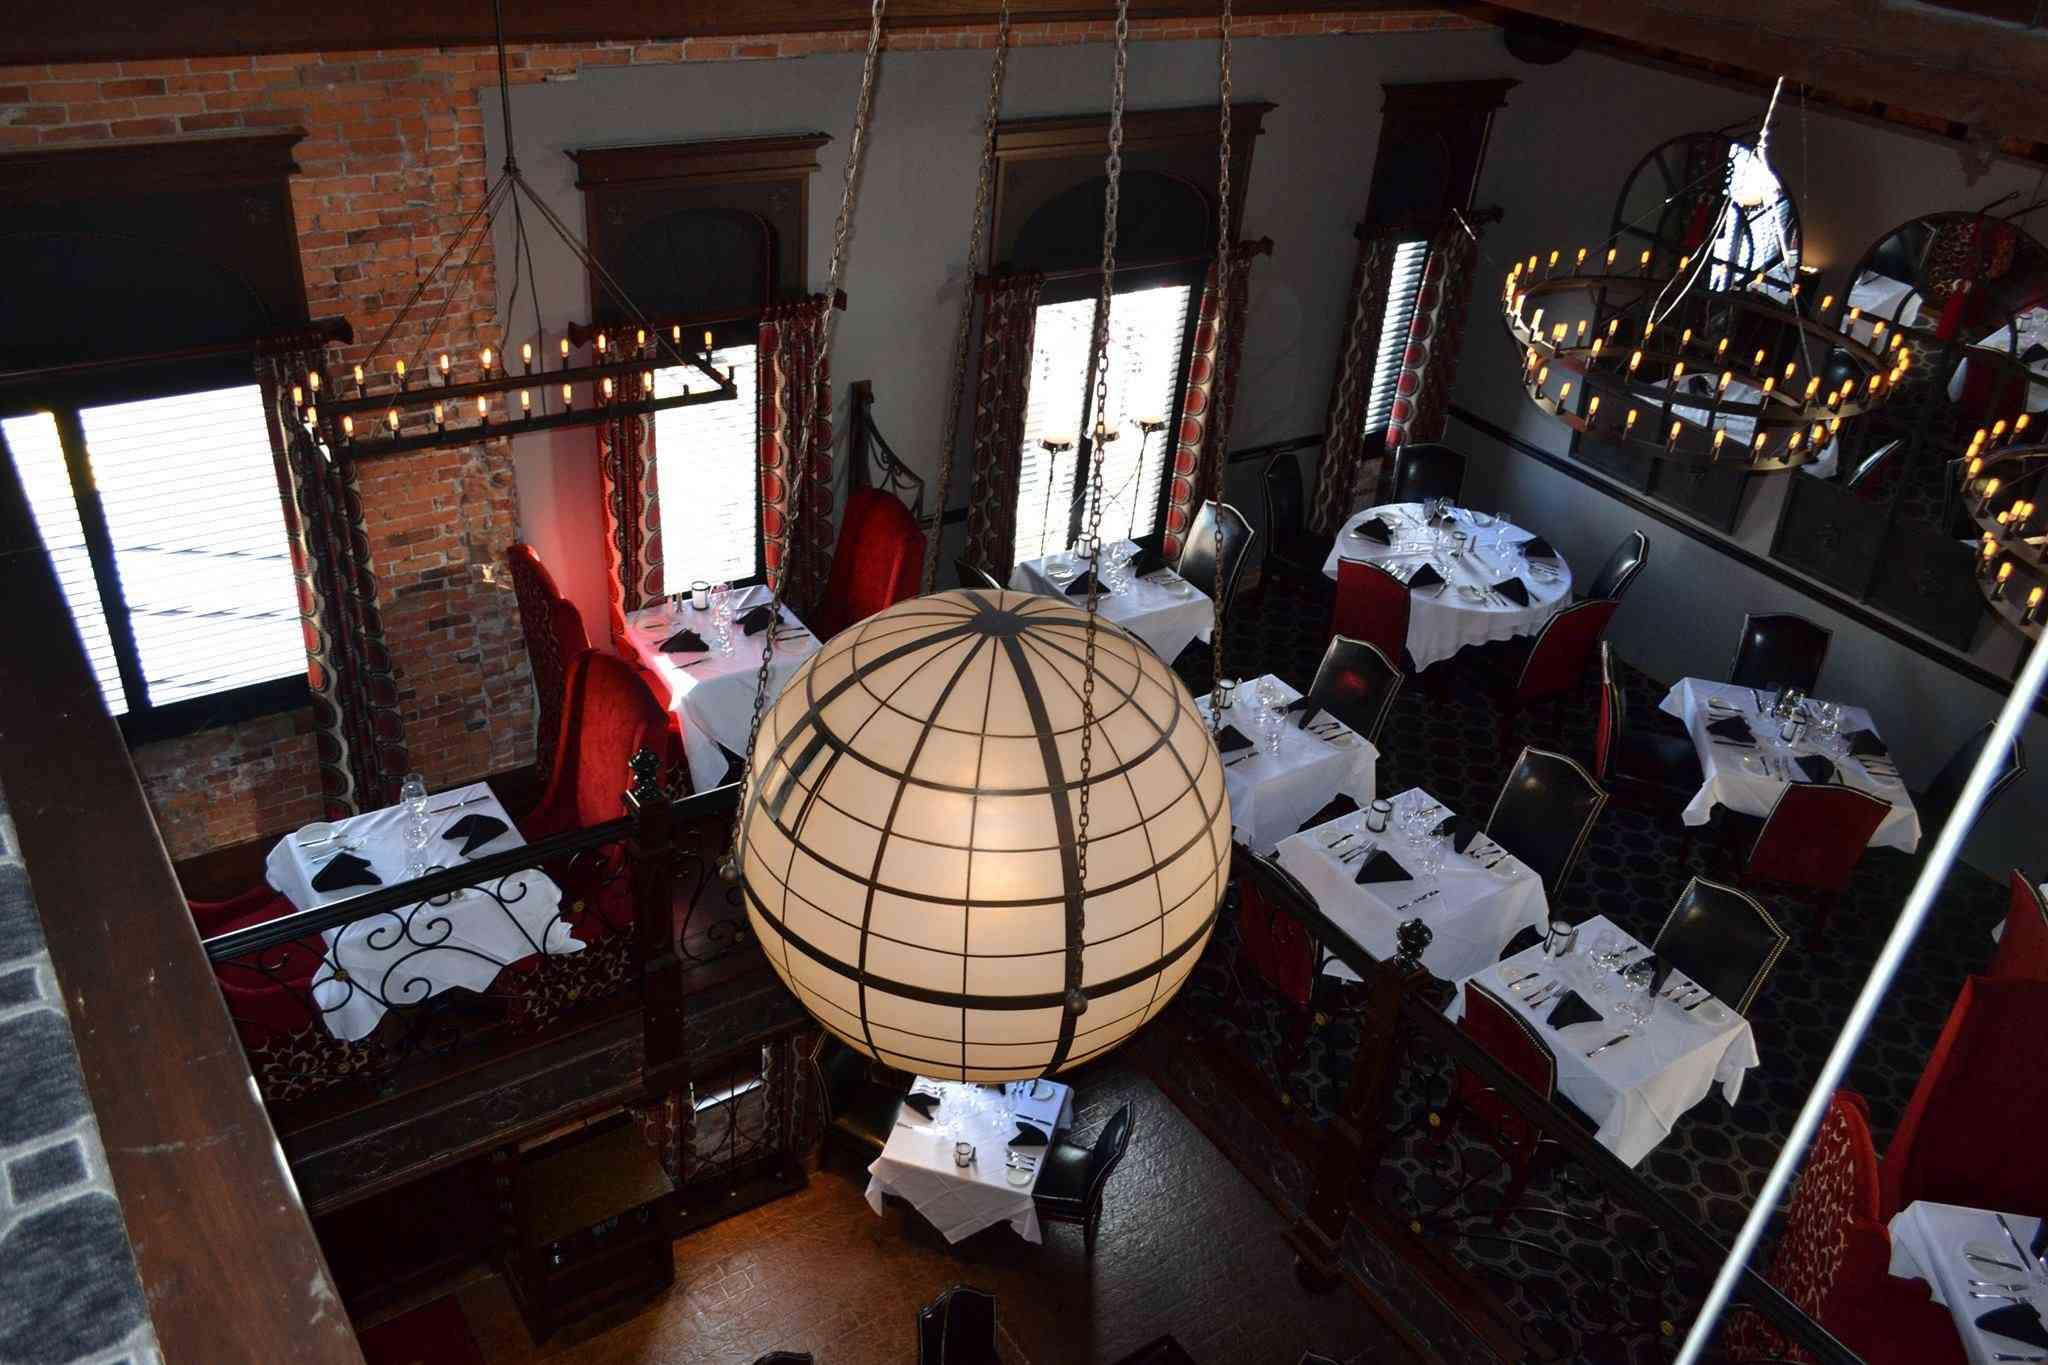 Buffalo Chophouse overhead view of dining room